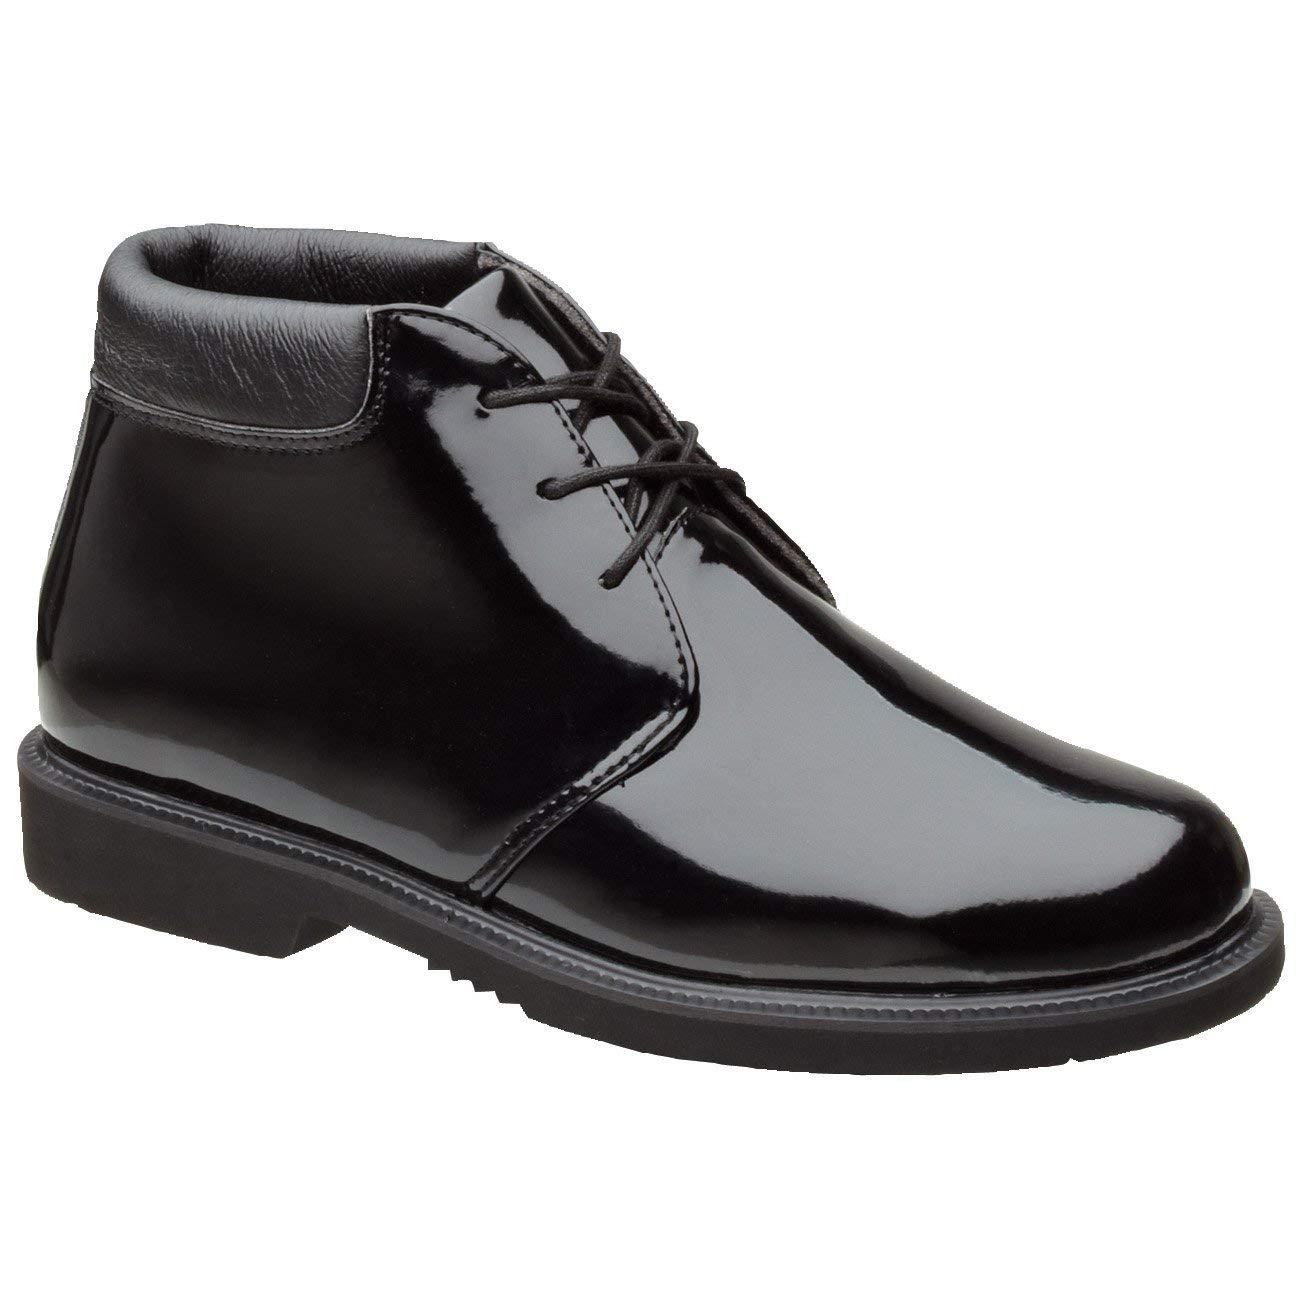 4e7fd2d78ef Cheap Thorogood Fire Boots, find Thorogood Fire Boots deals on line ...